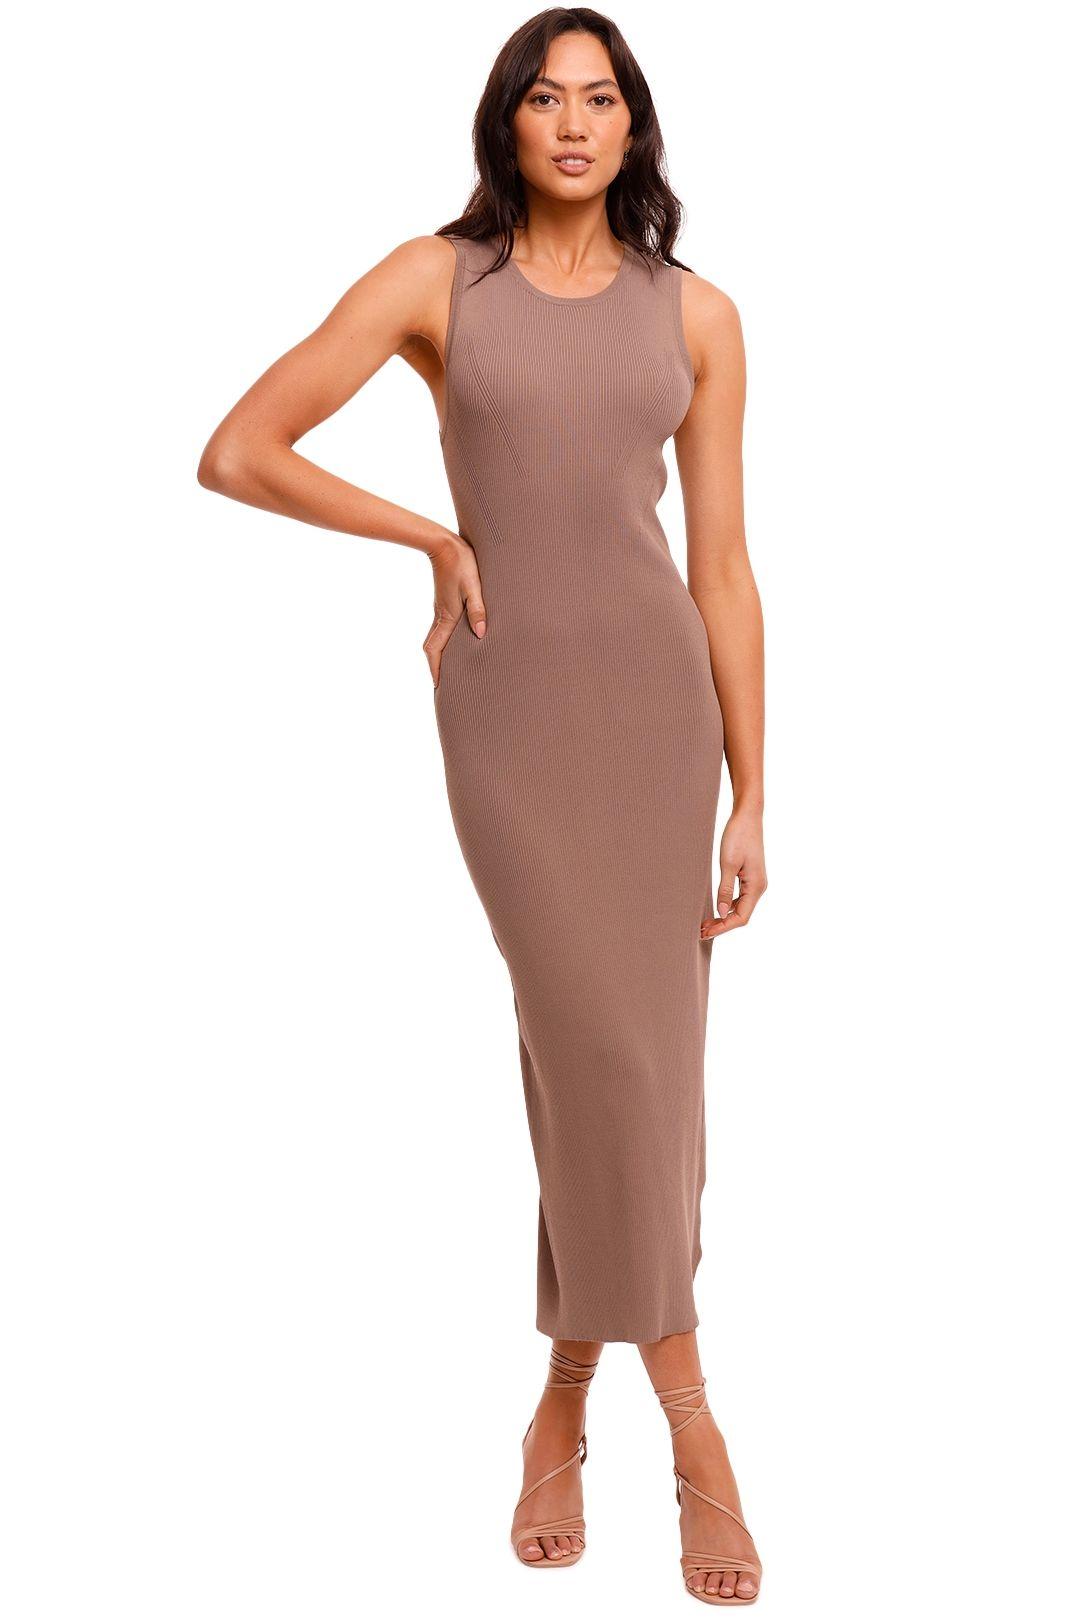 Elka Collective Tone Knit Dress bodycon